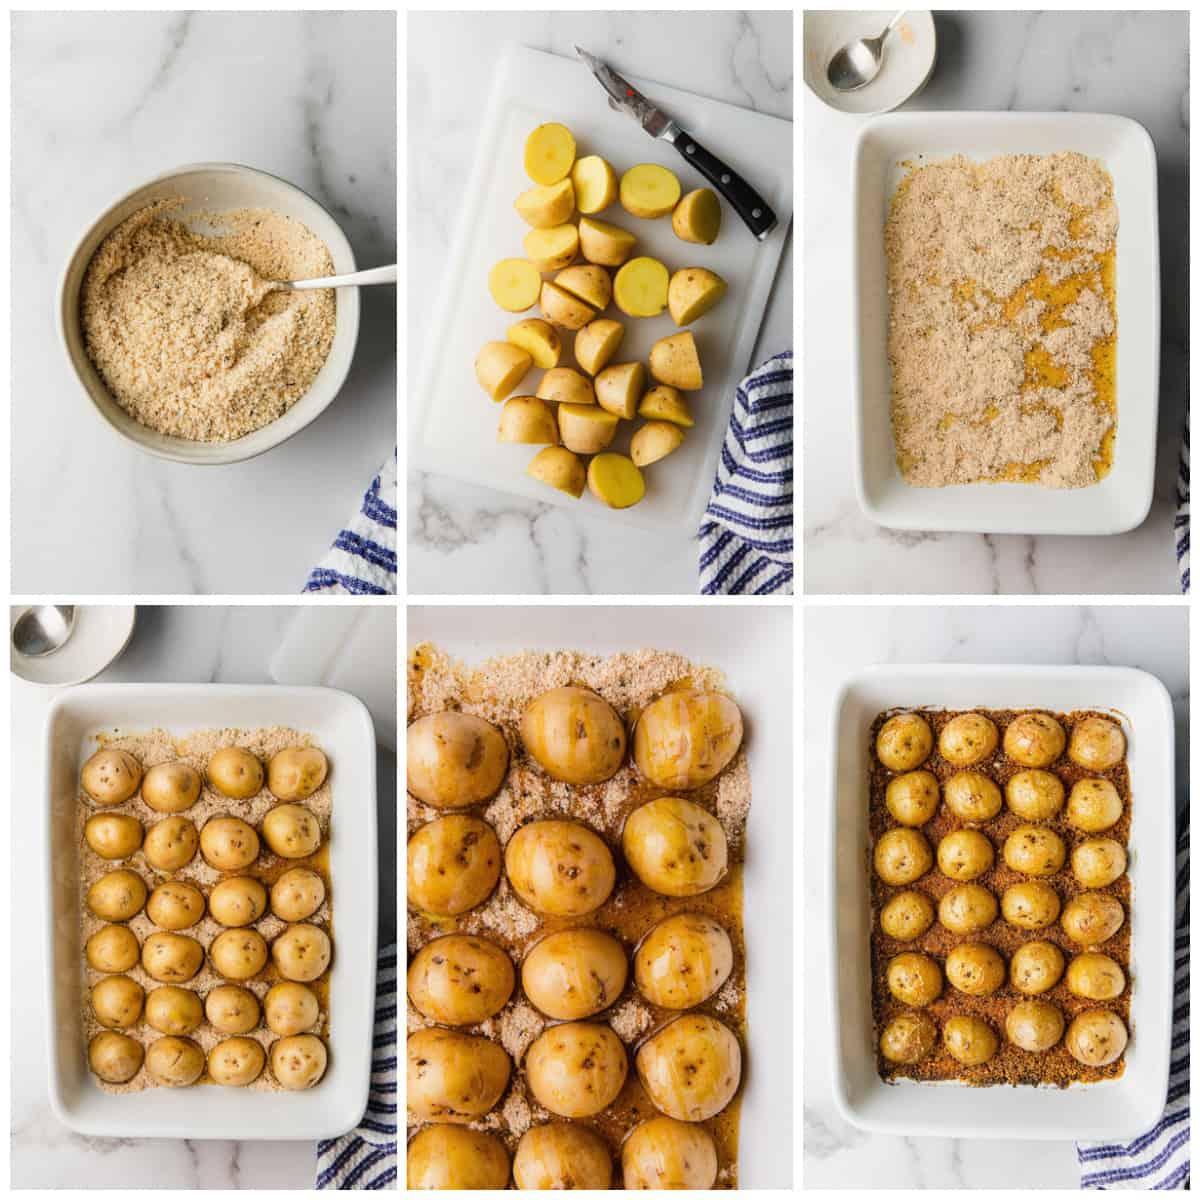 Step by step photos on how to make Crispy Parmesan Potatoes